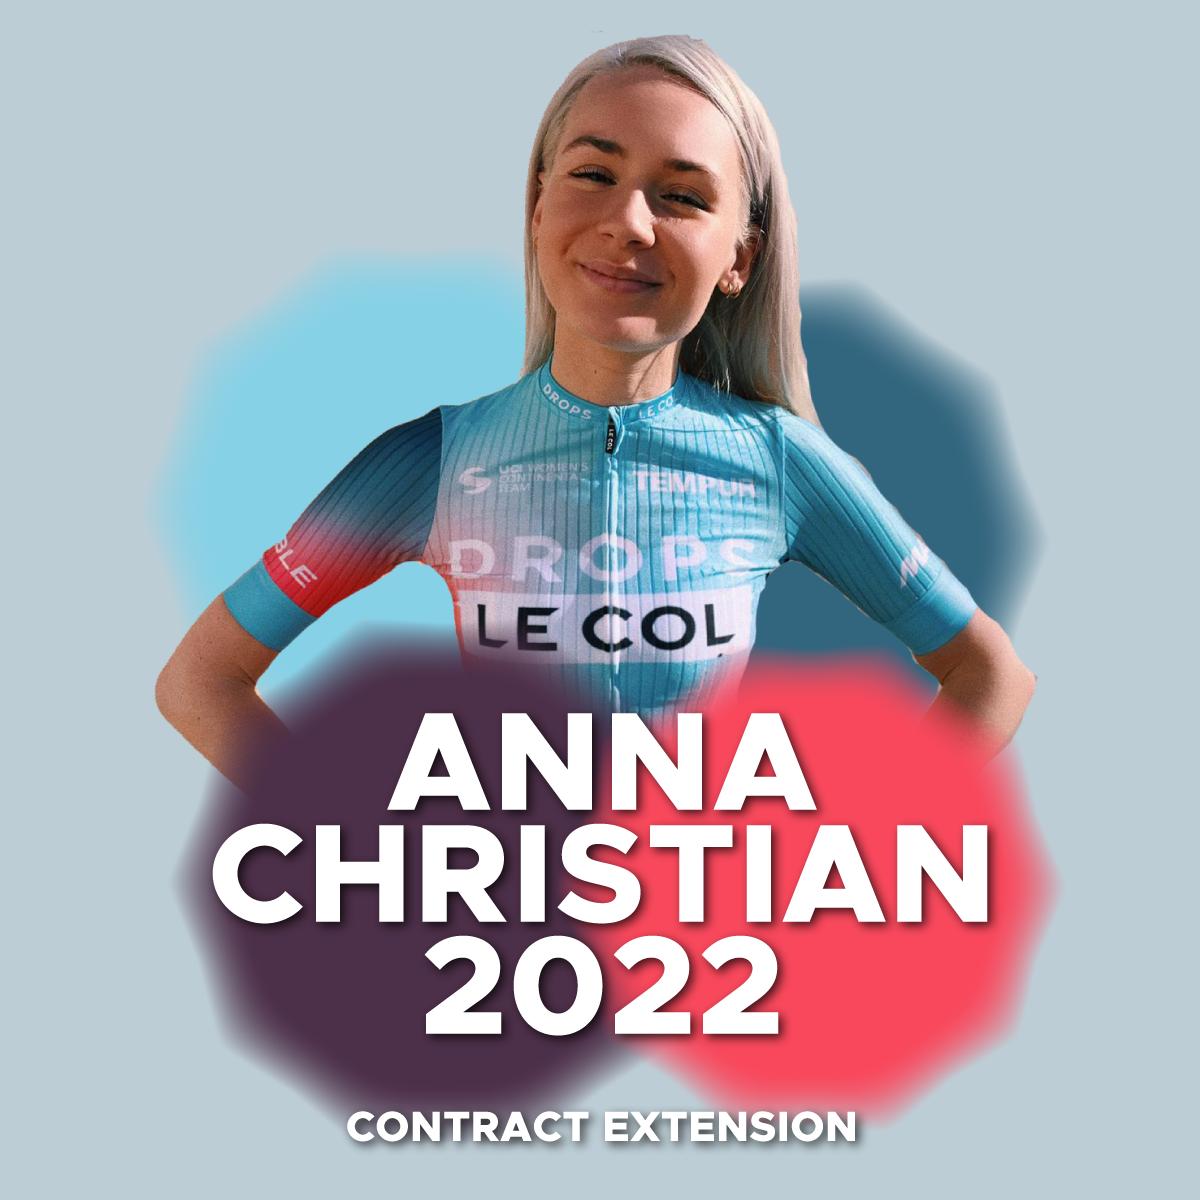 Anna Christian Extends Contract